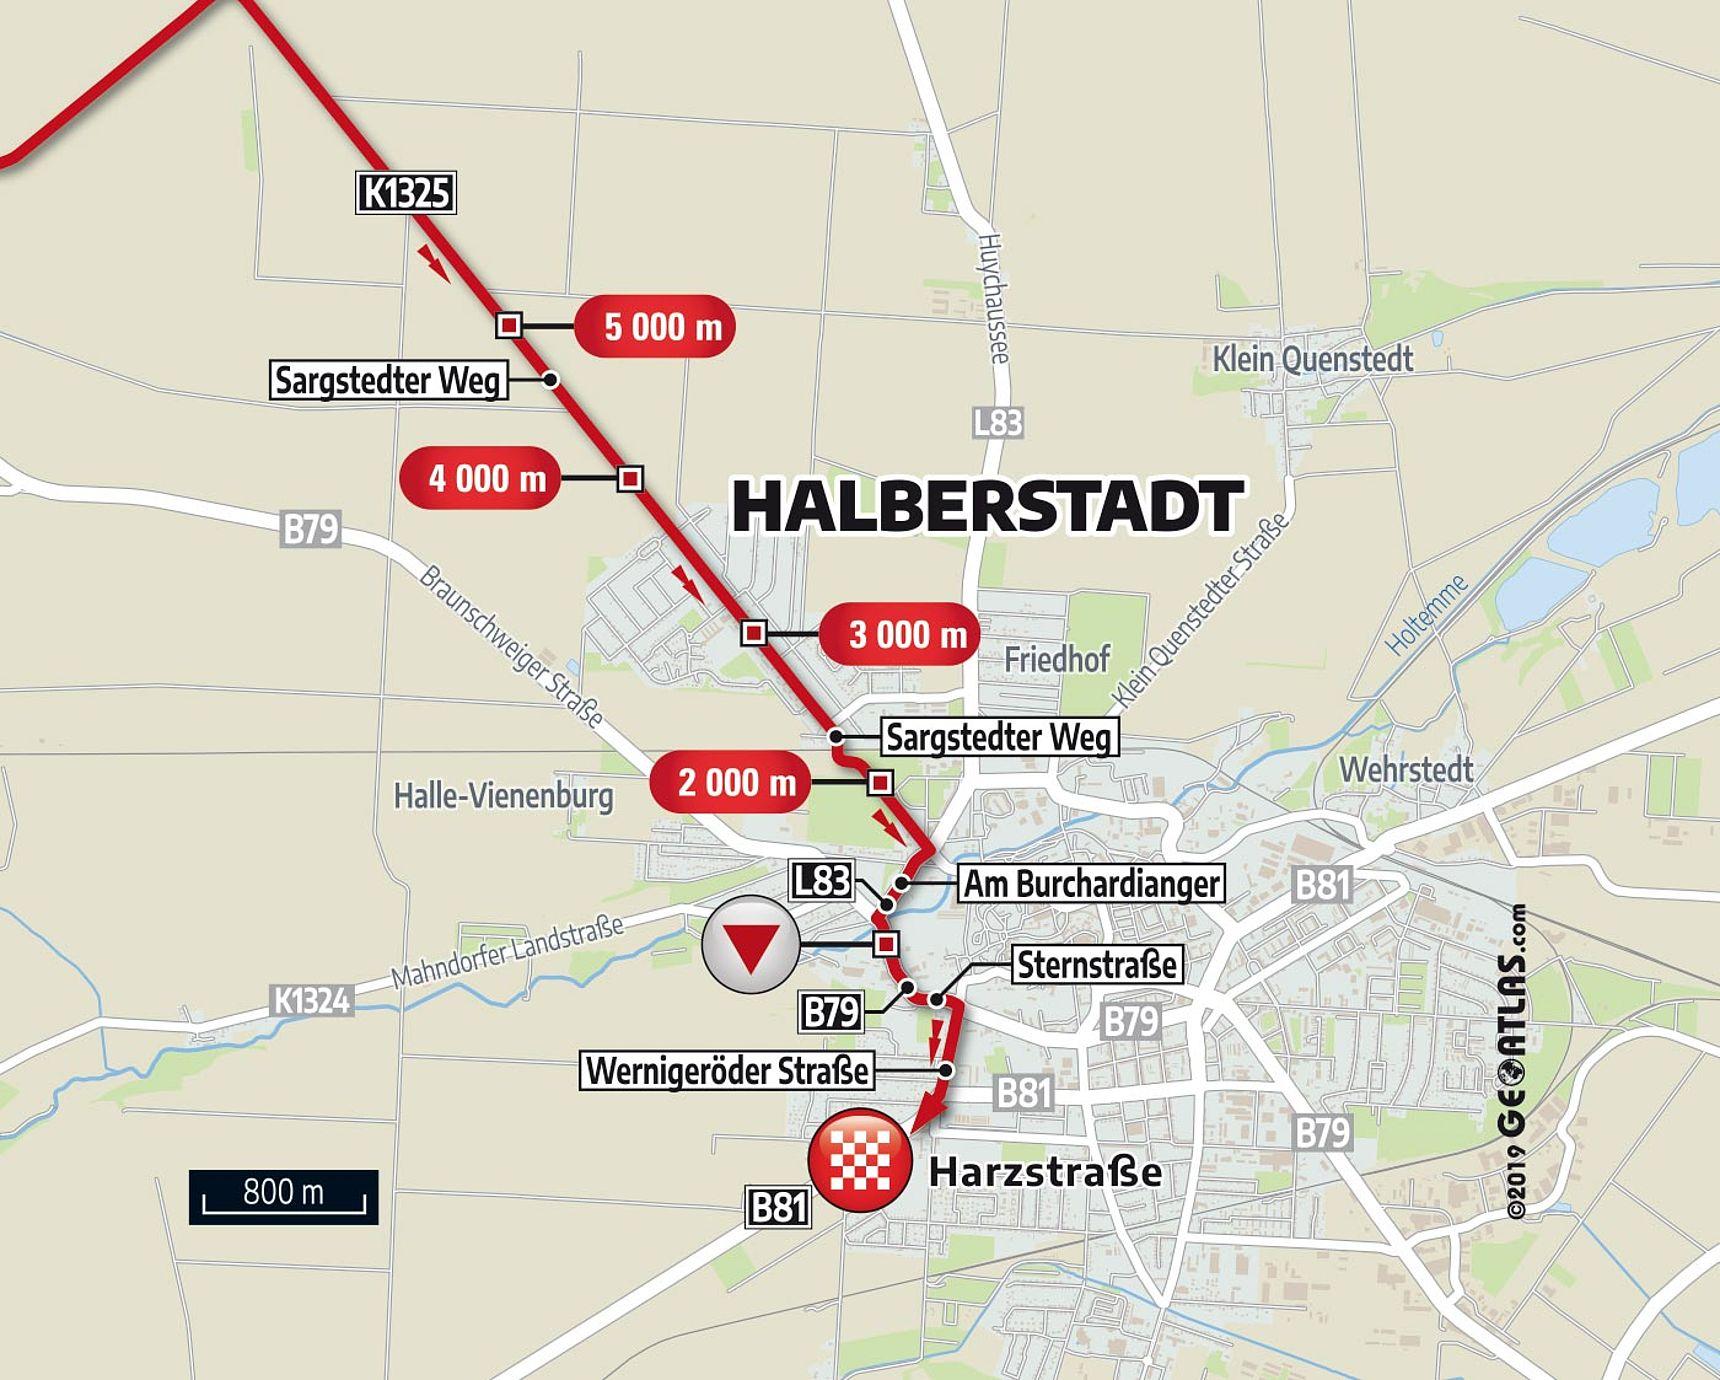 [Translate to English:] Karte Letzter KM E1